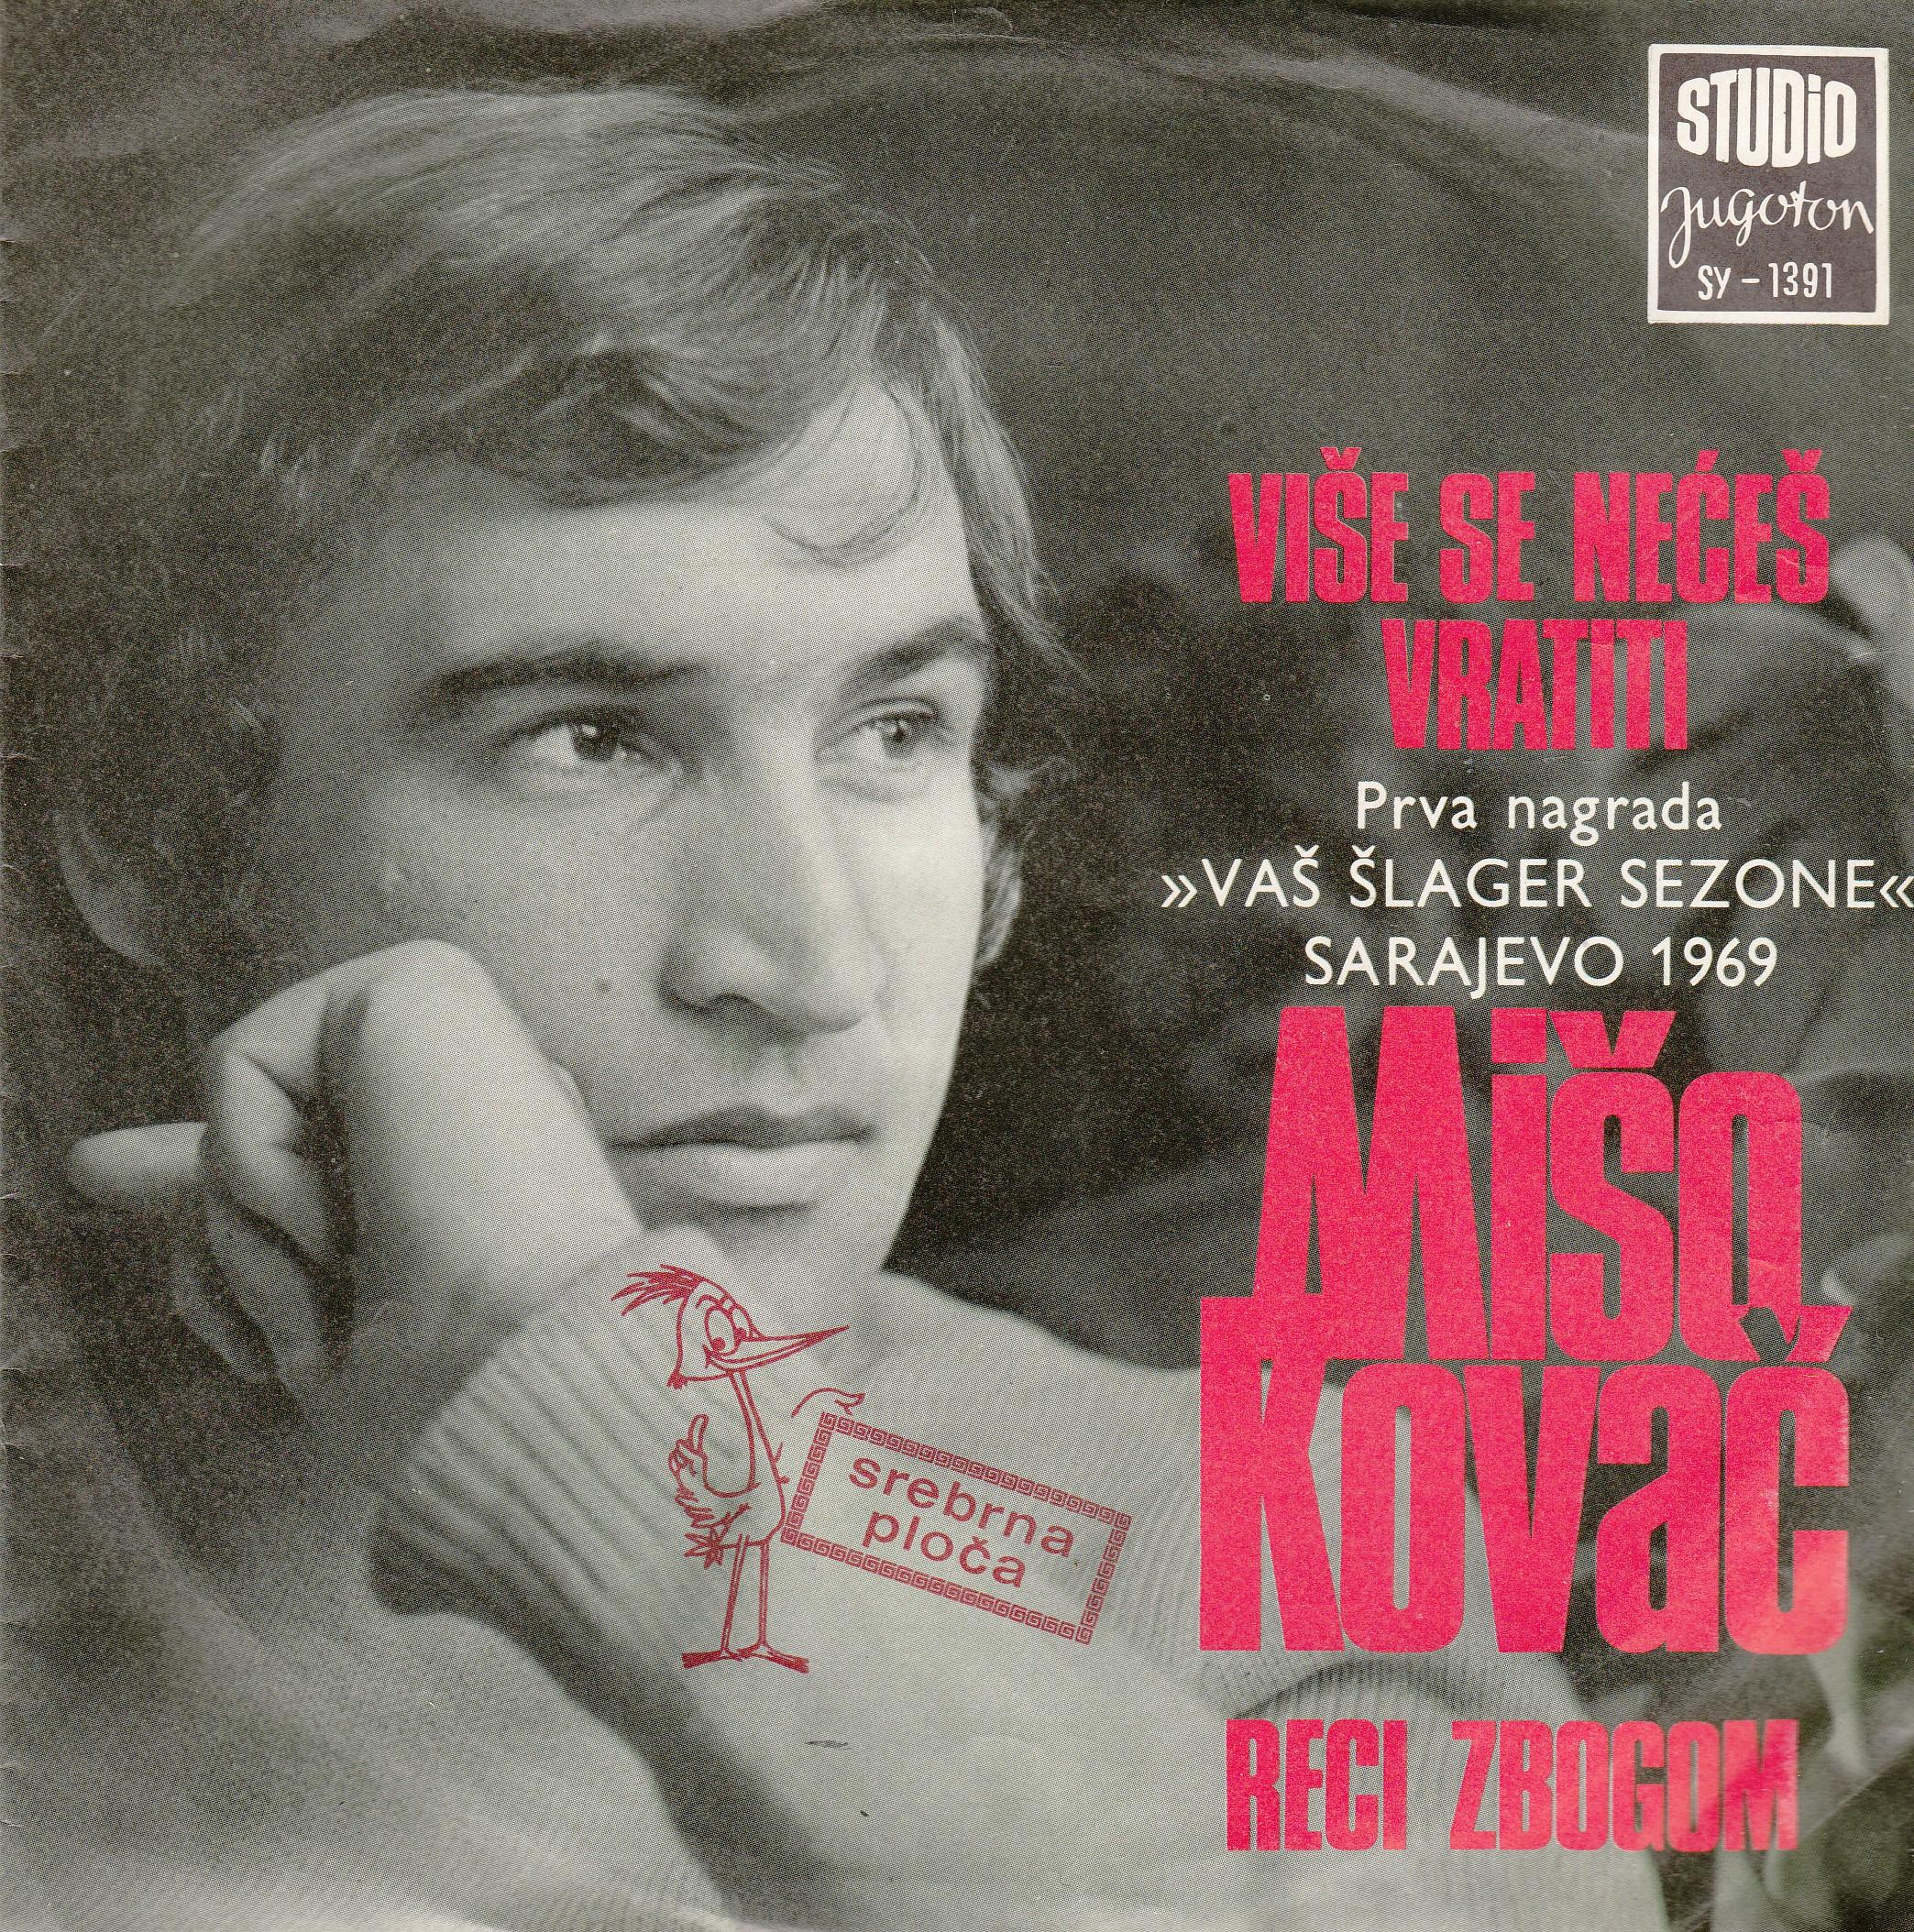 Kovac Miso - Vise Se Neces Vratiti/reci Zbogom